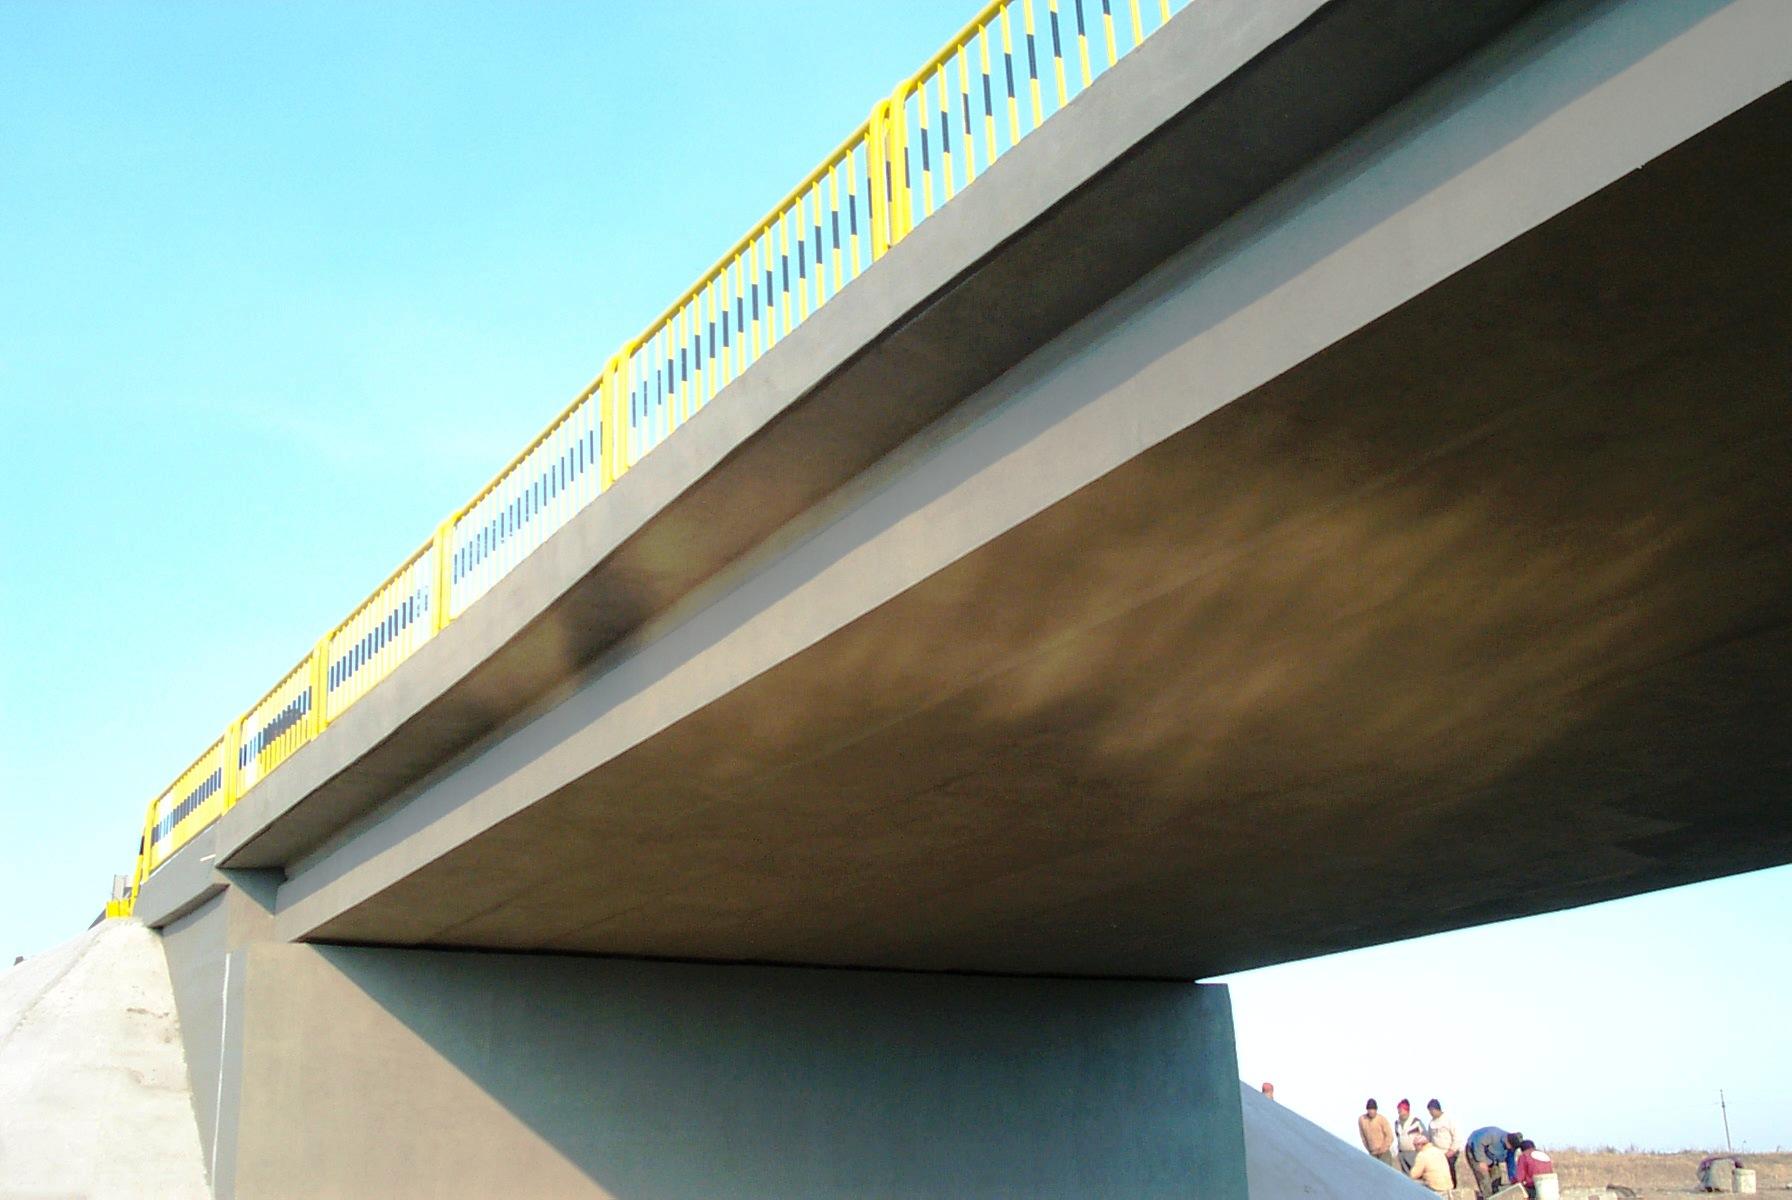 Reparatii pod (DN2), Km. 33 - 028, peste raul Calnistea MAPEI - Poza 128